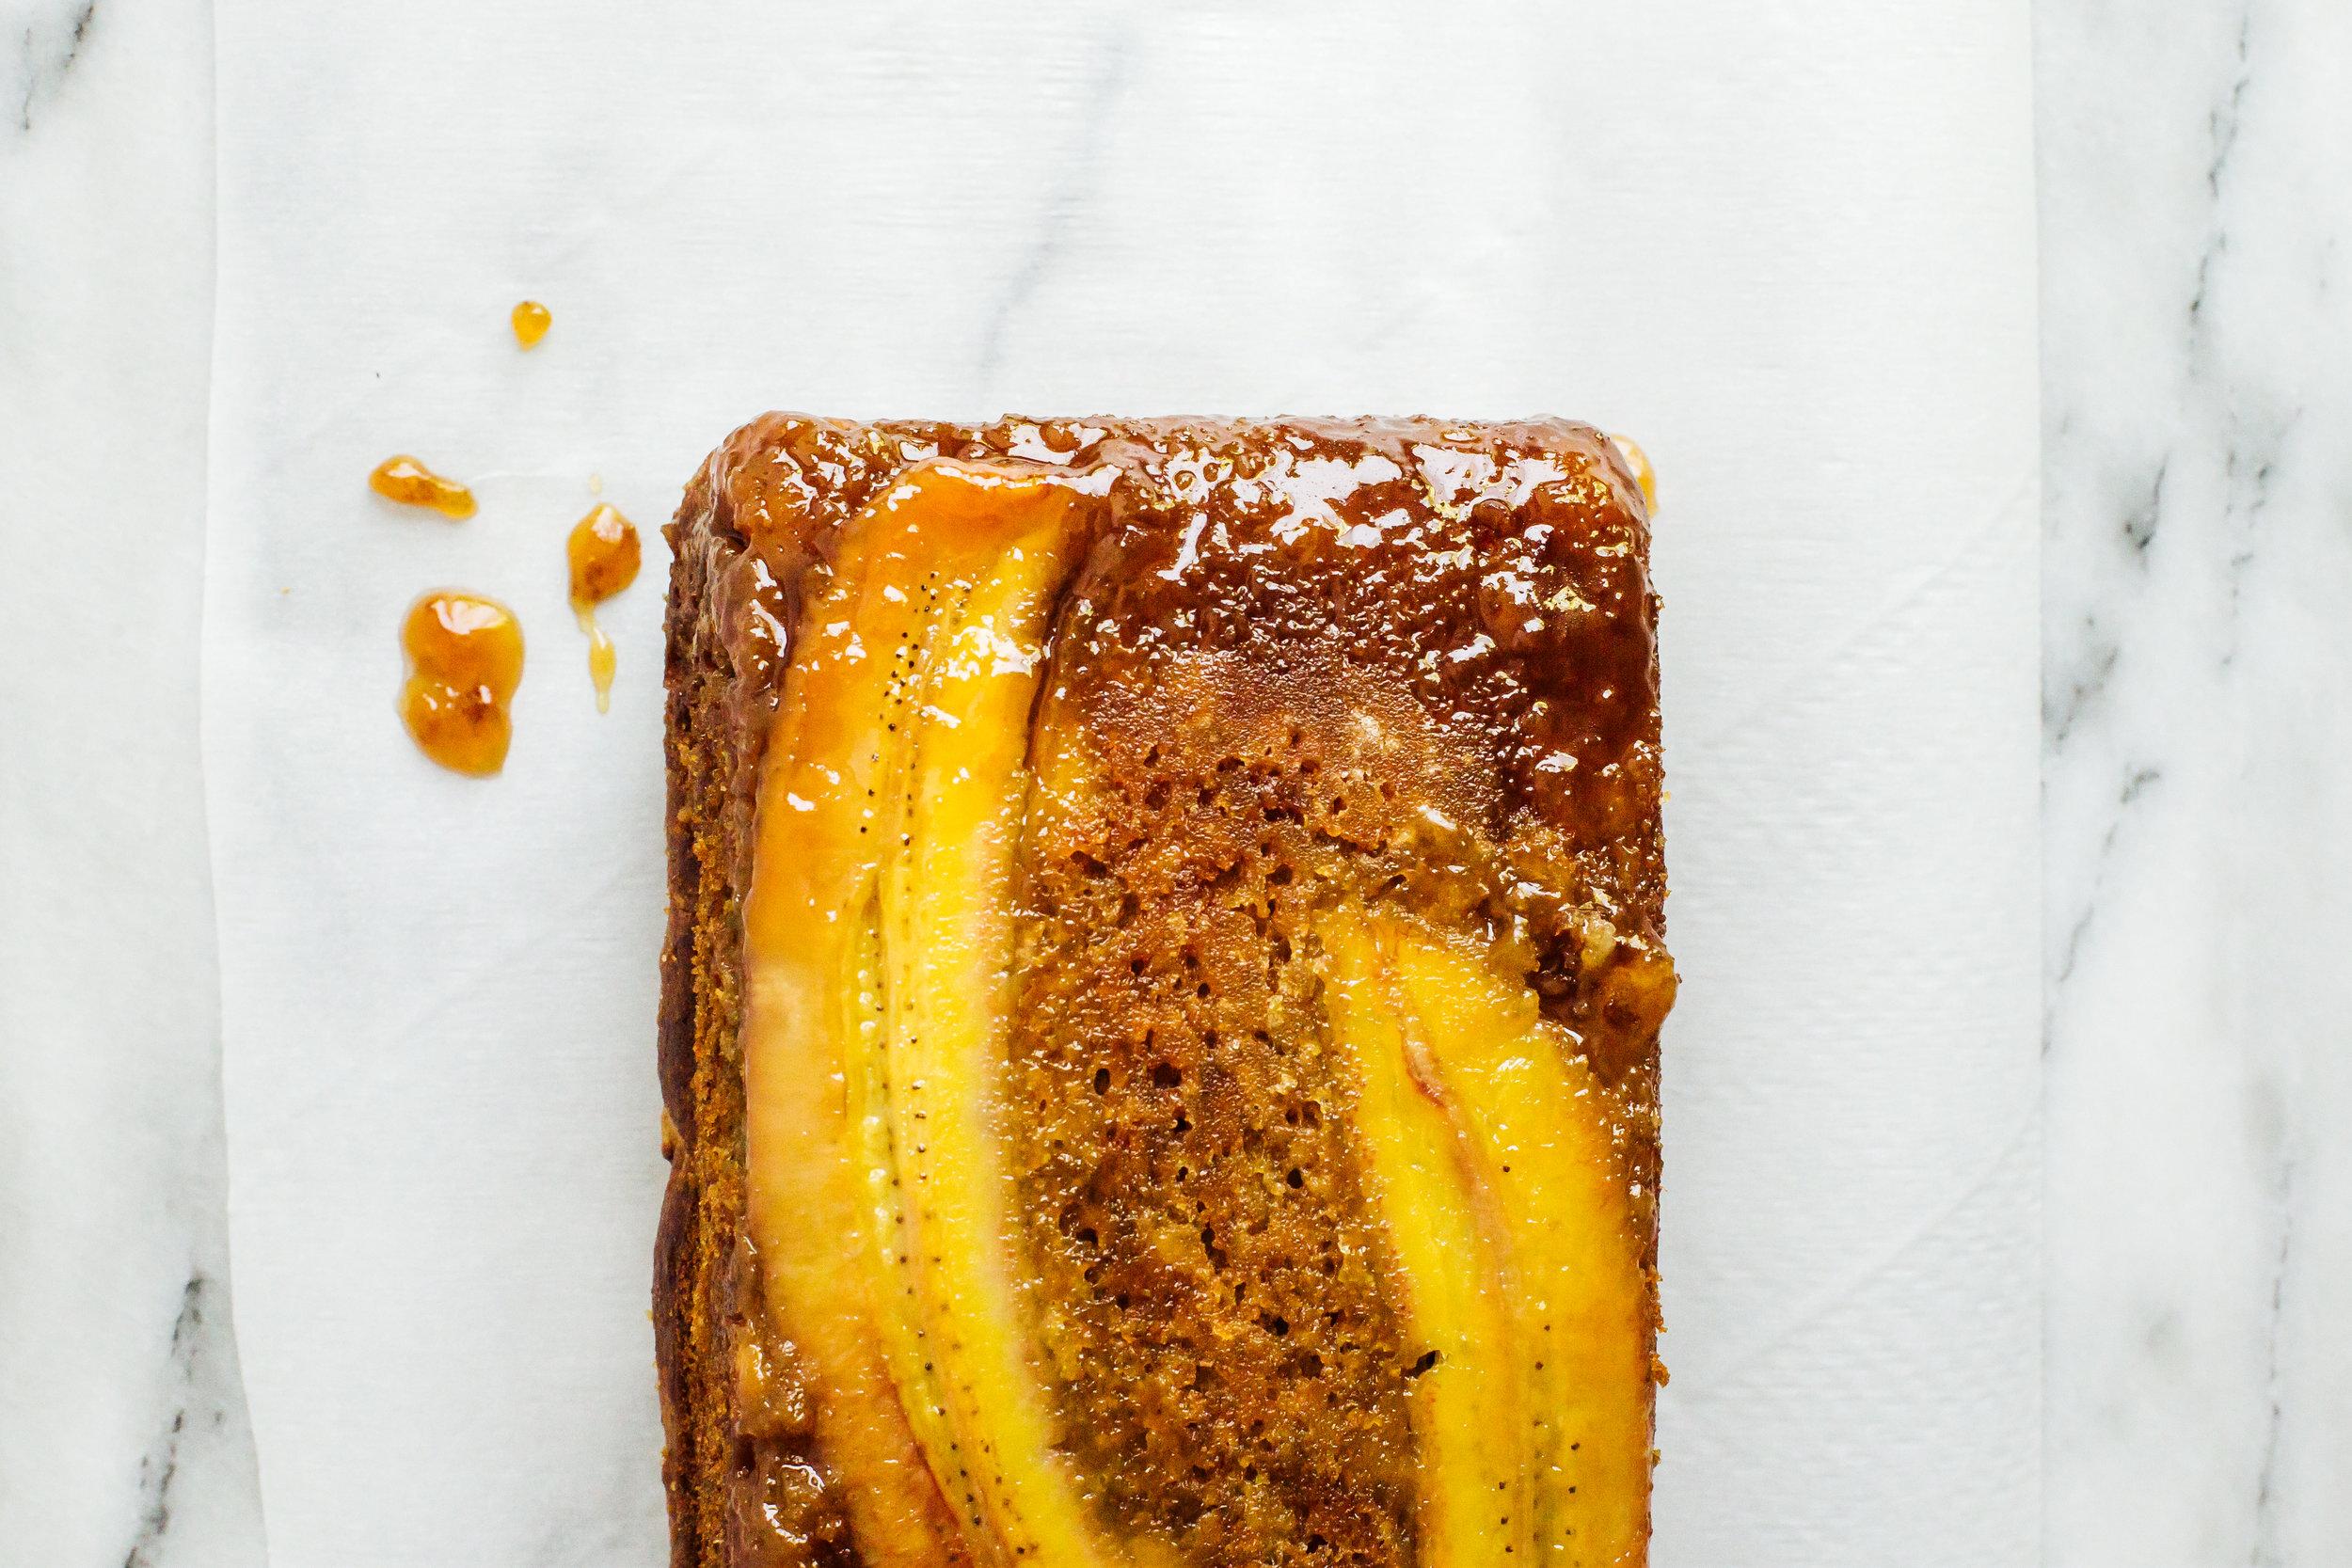 upside_down_rum_banana_bread-10.jpg